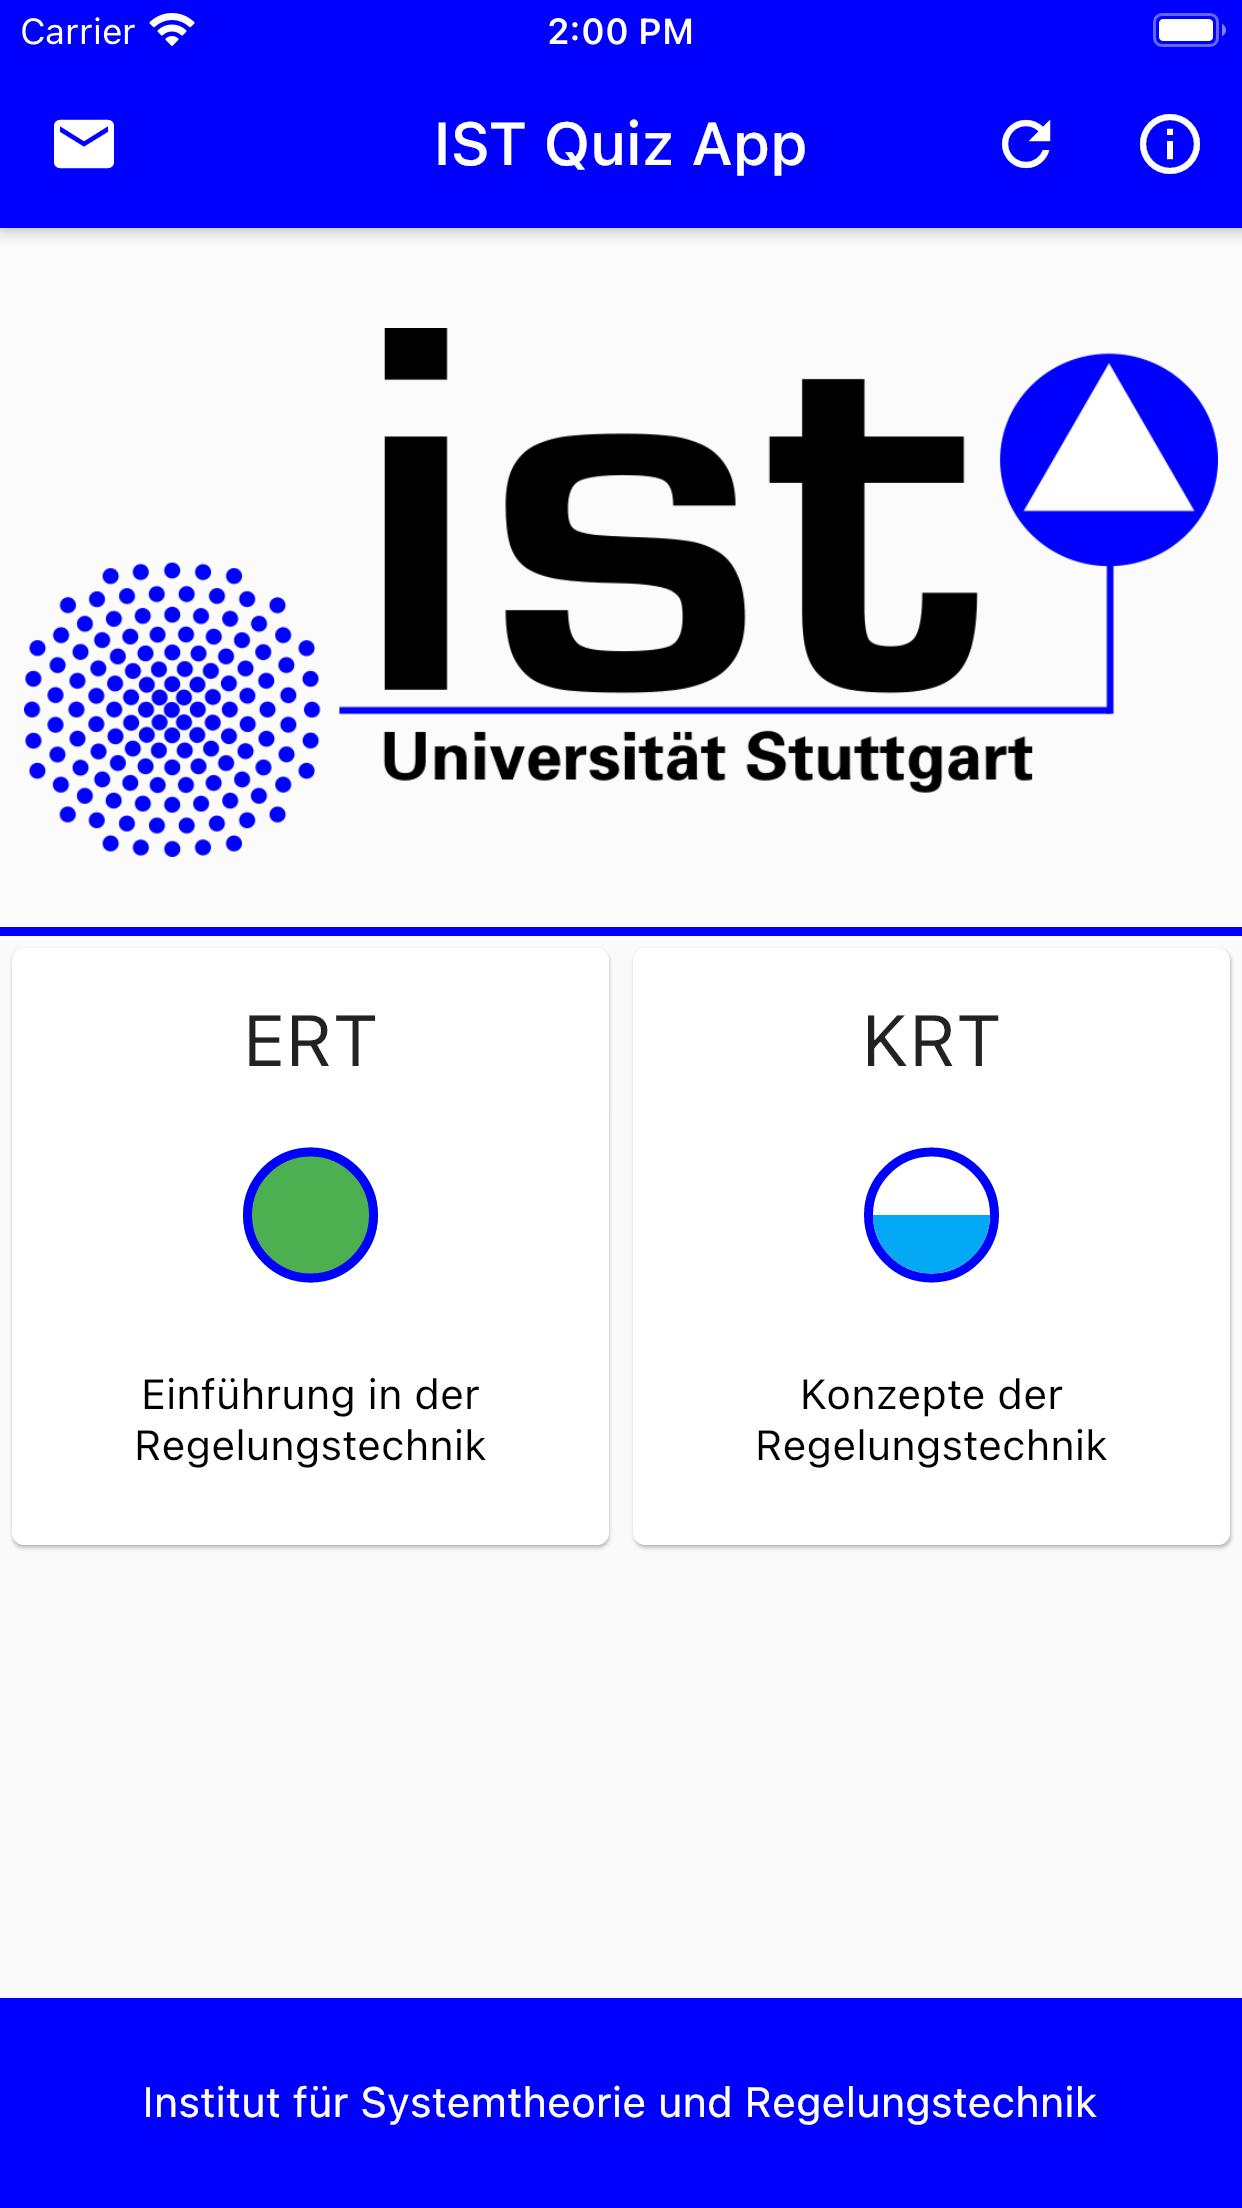 https://opencms.uni-stuttgart.de/fak7/ist/teaching/elearning/figures_eLearning/Screenshot_ktapp_start.png